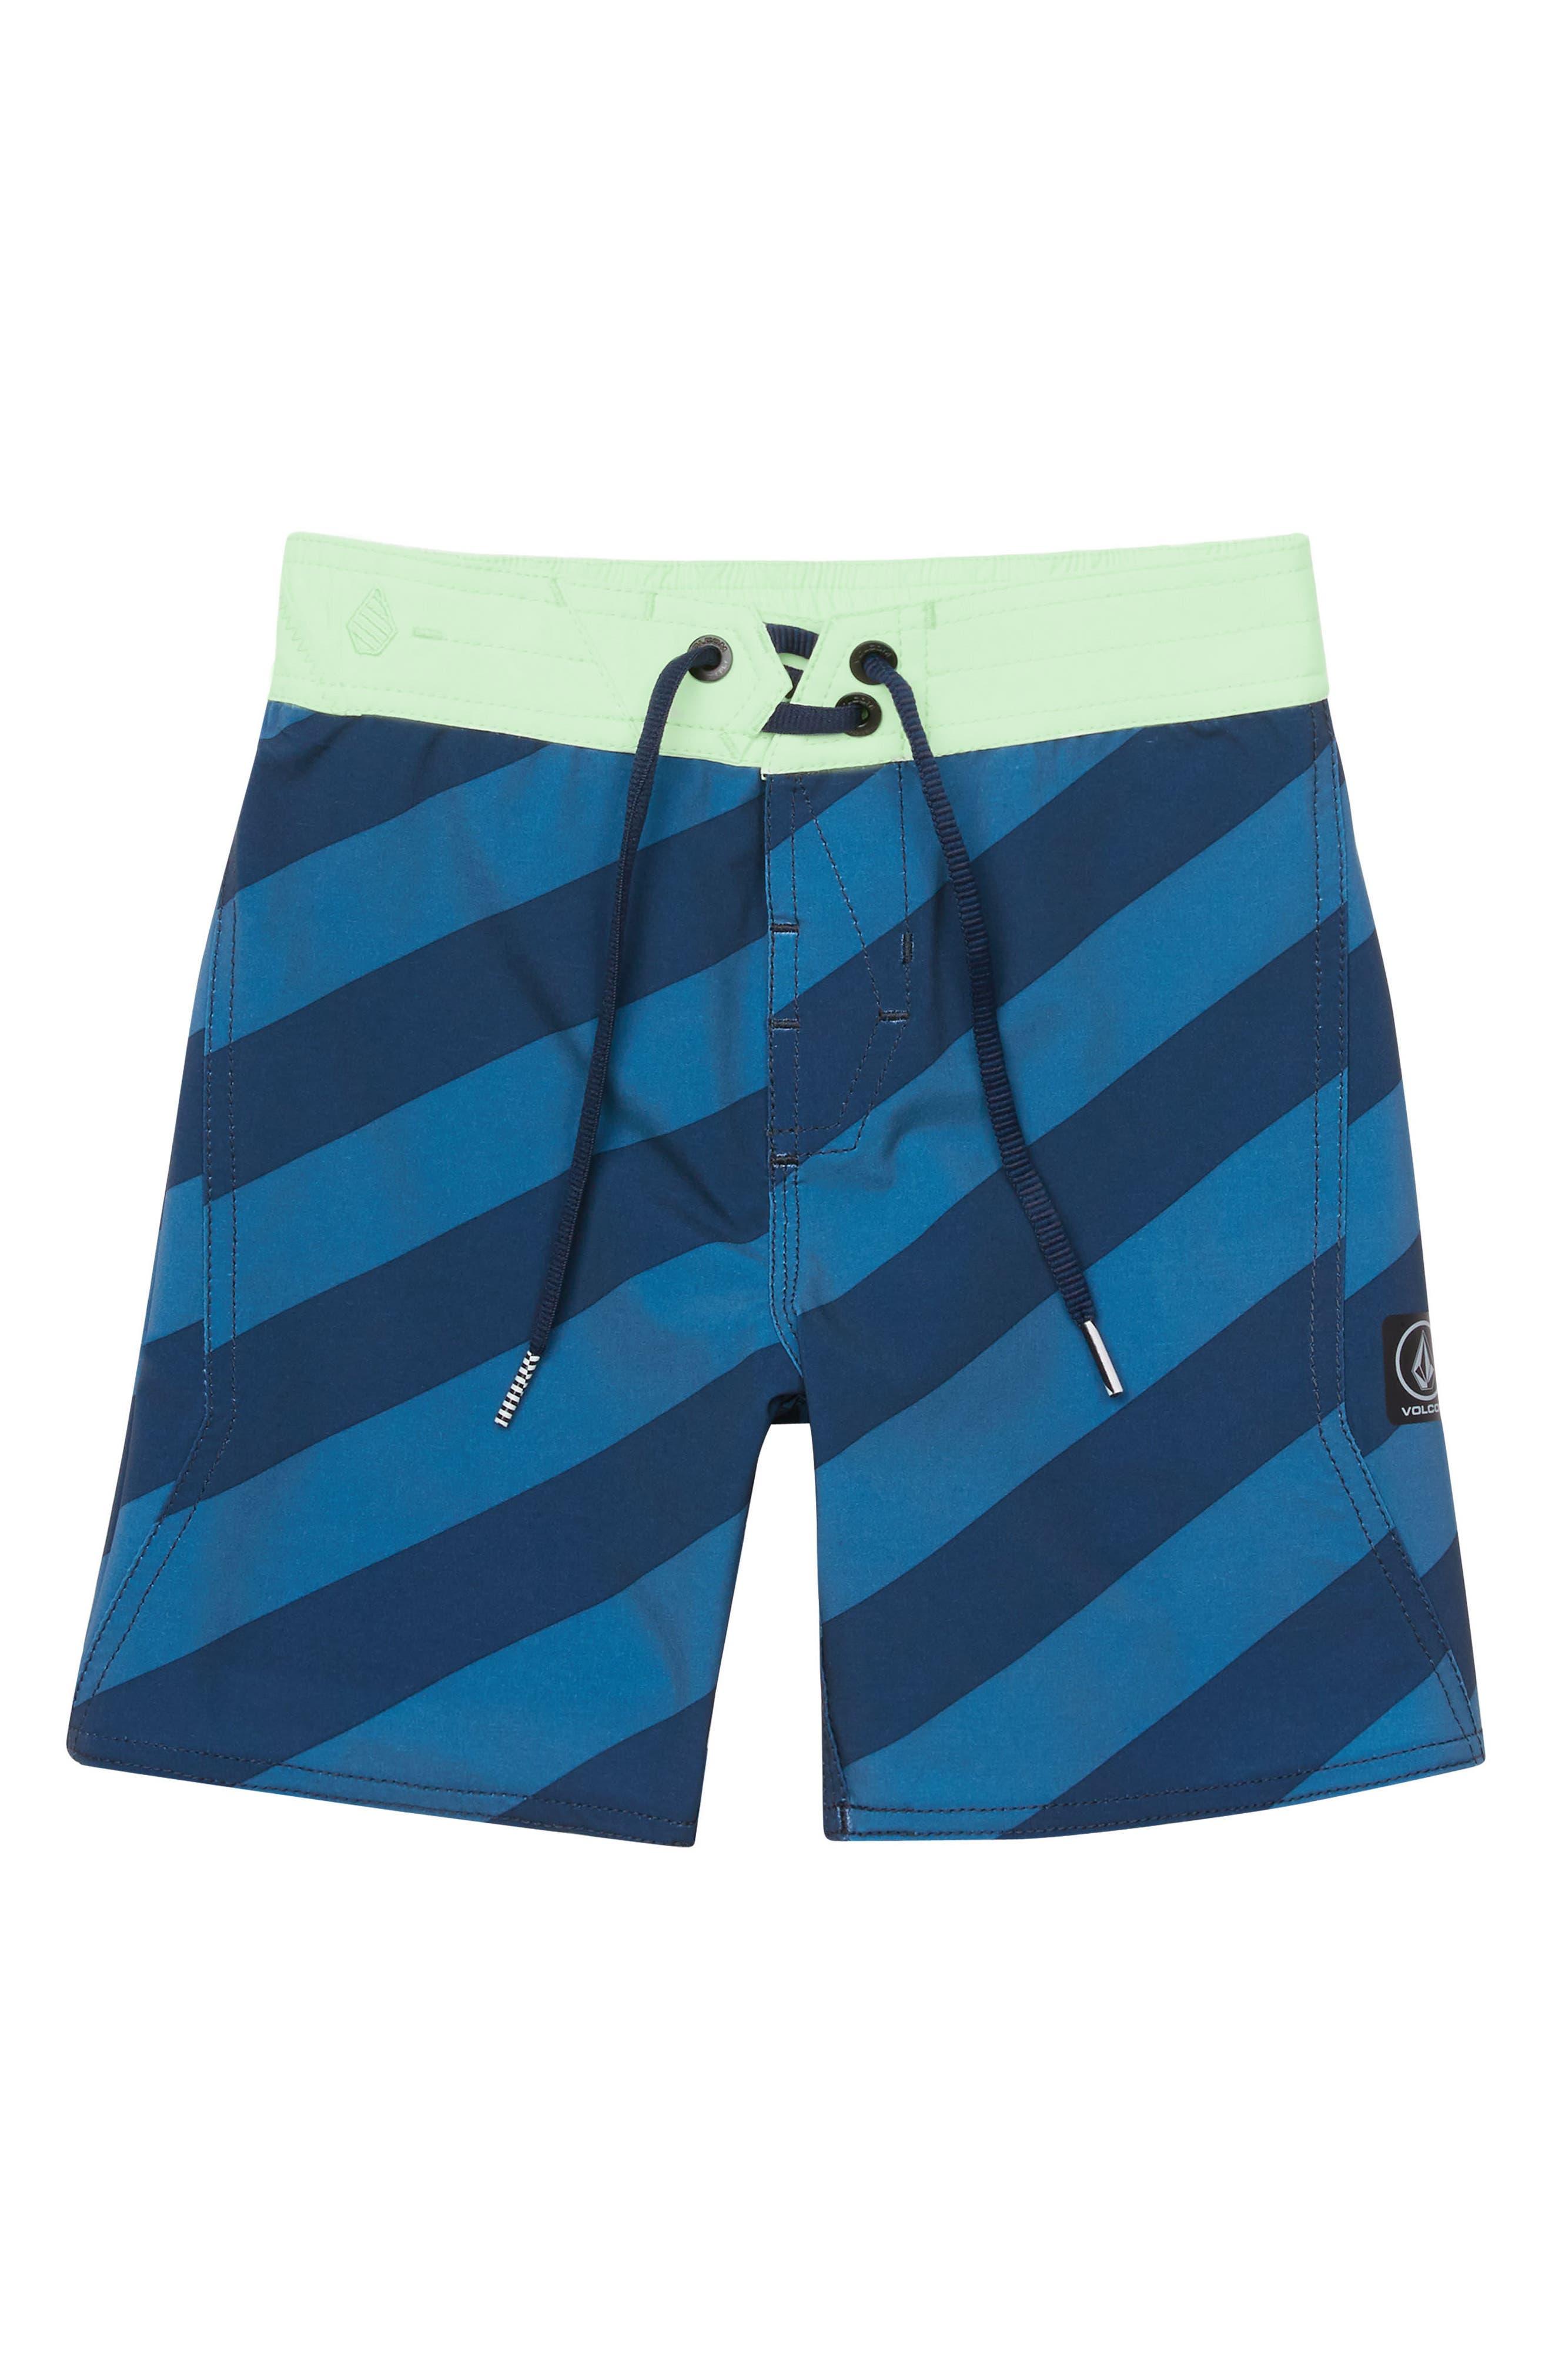 Stripey Board Shorts,                             Main thumbnail 1, color,                             Indigo